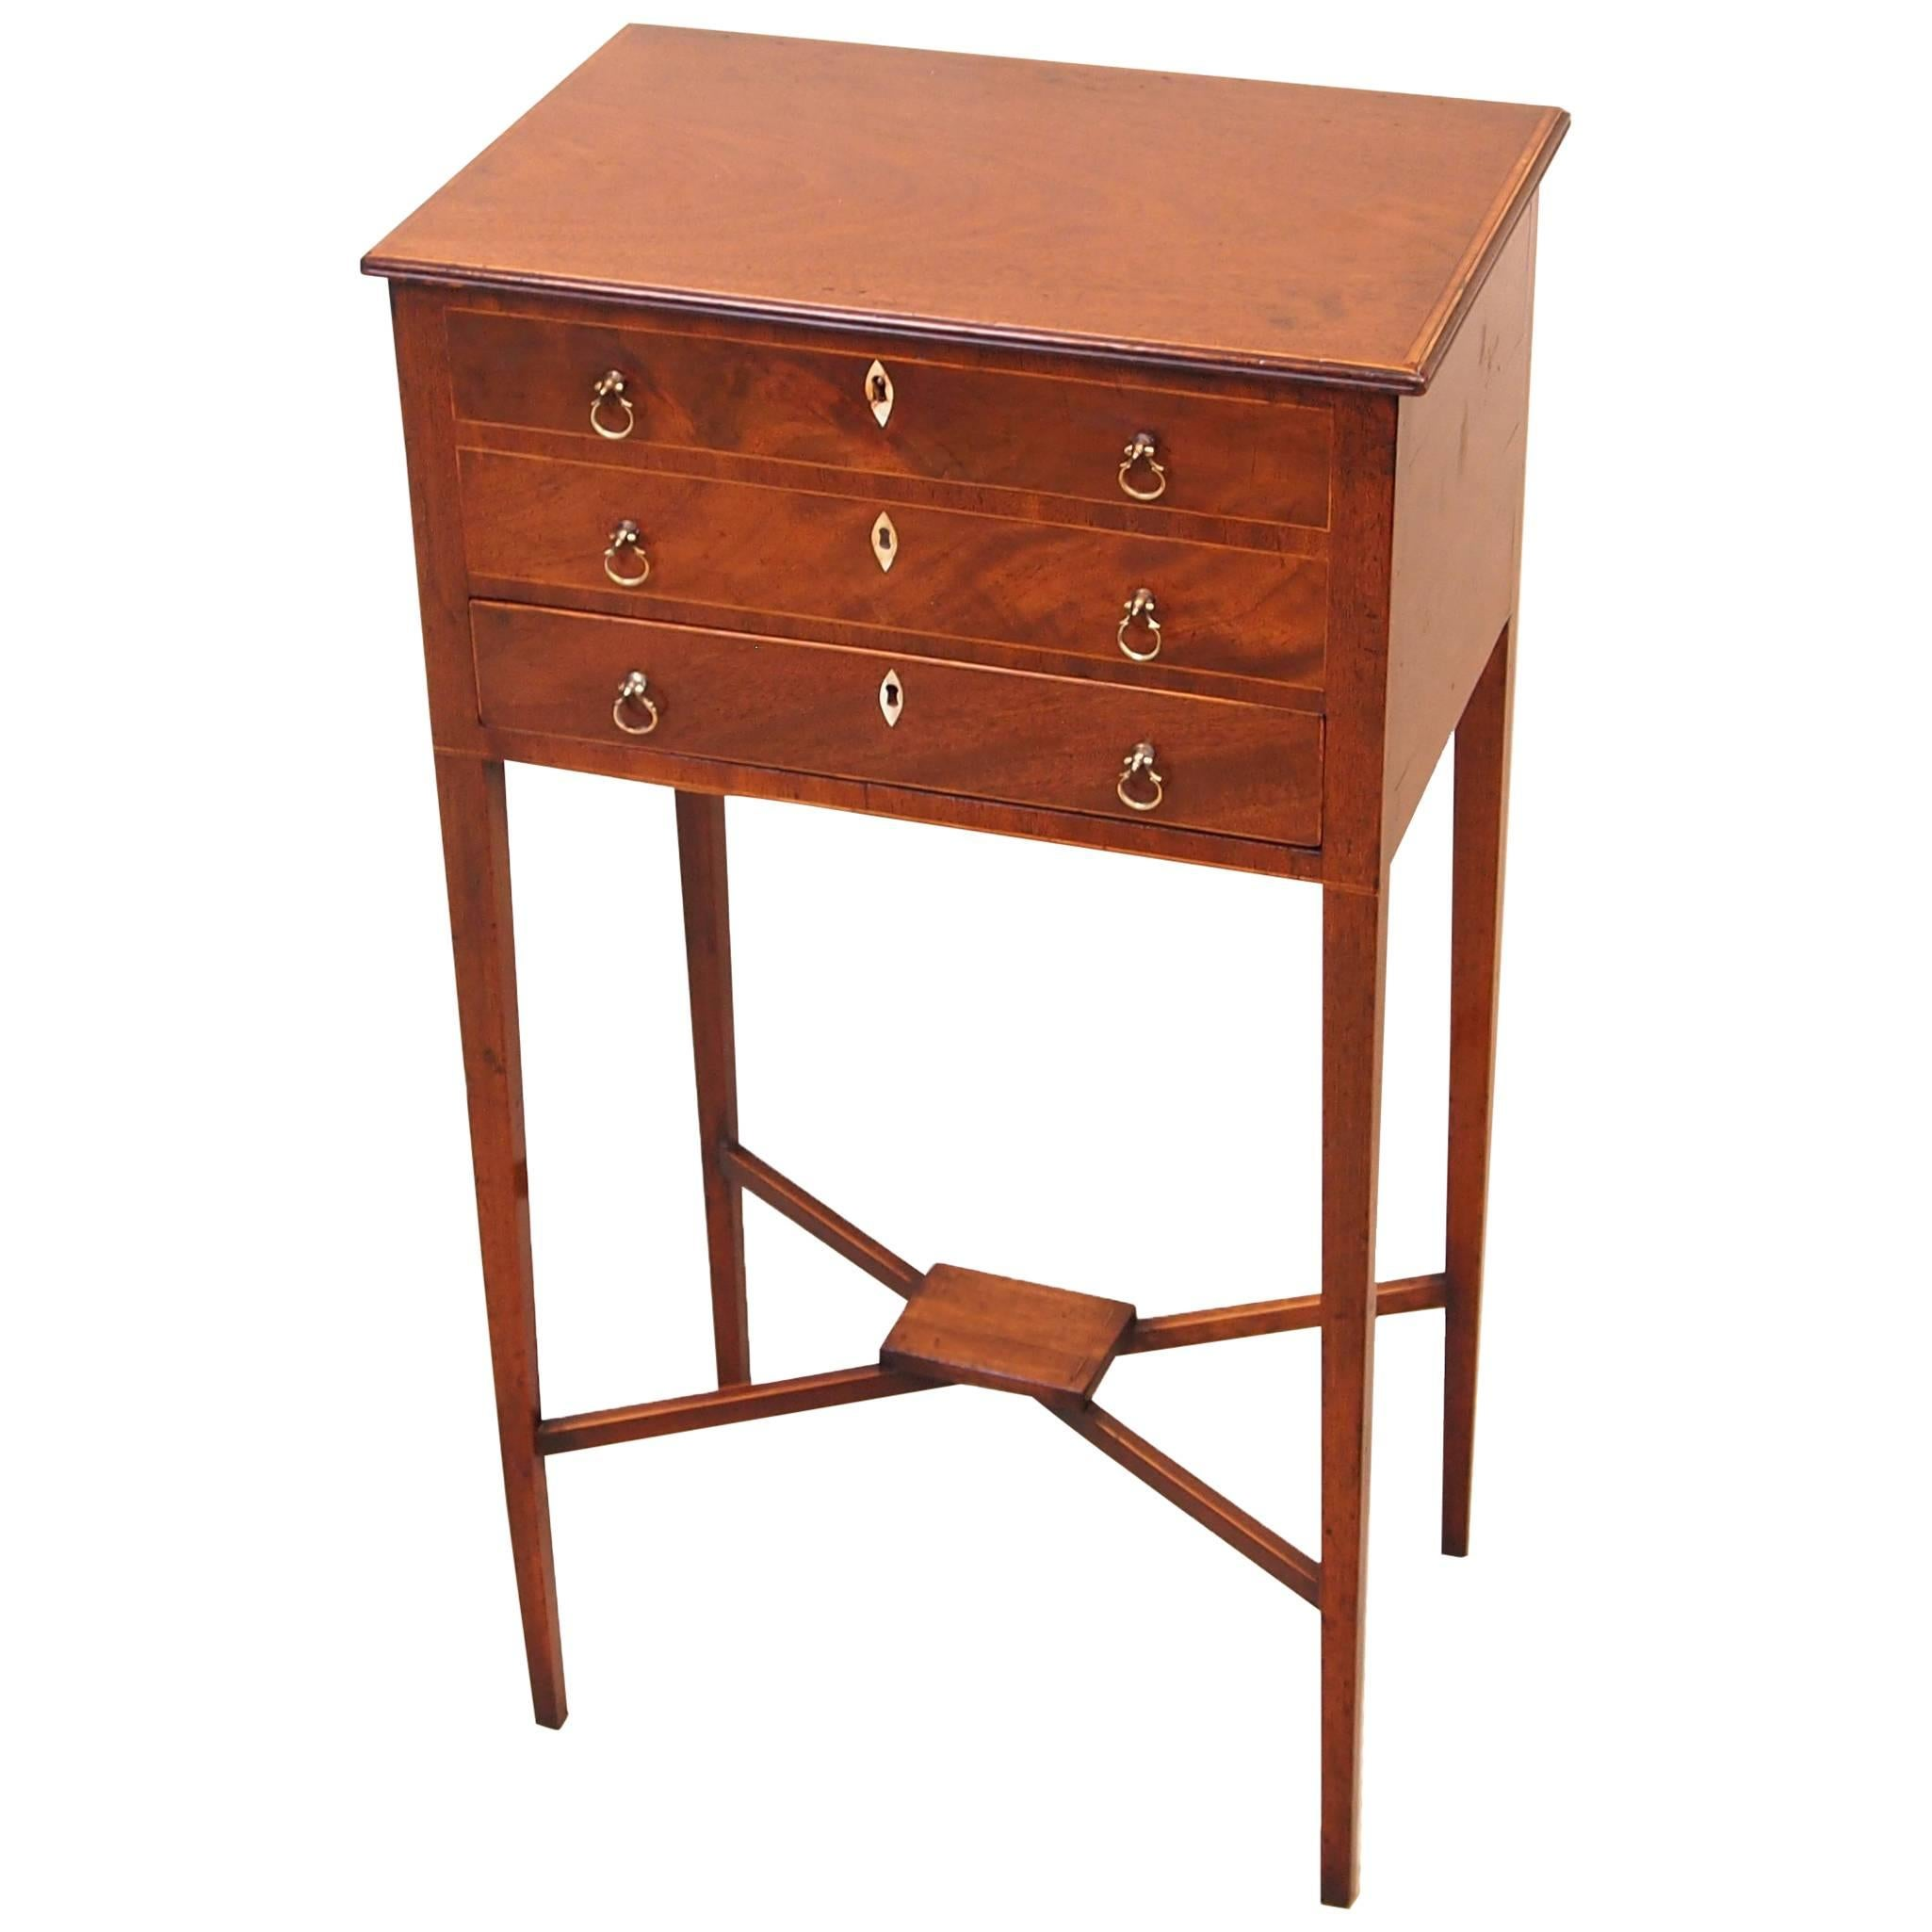 Antique 18th Century Mahogany Work Table